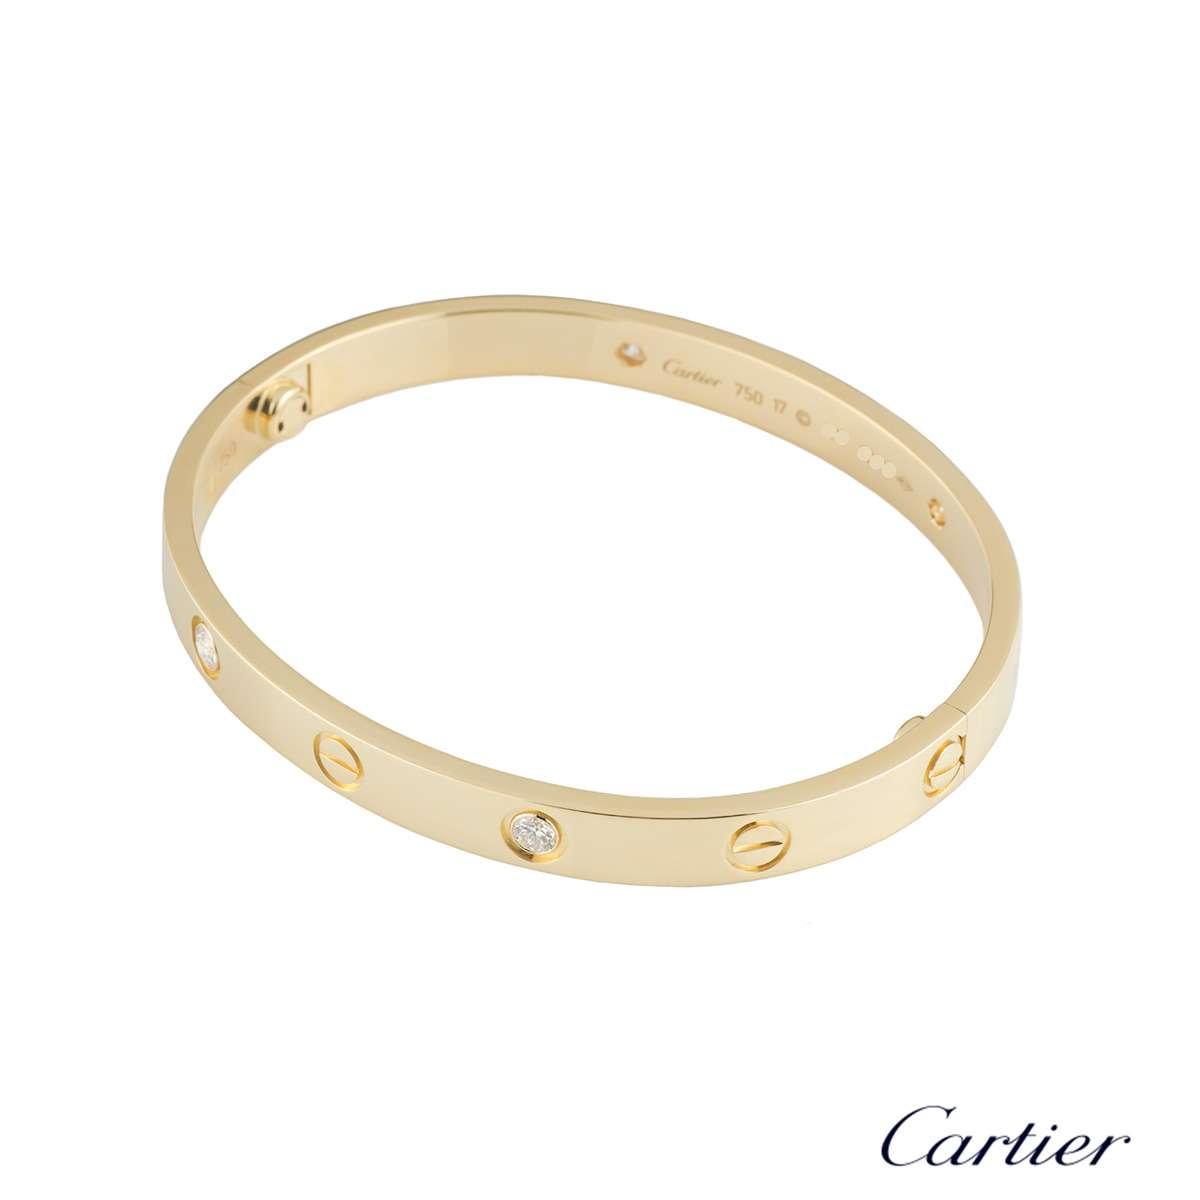 Cartier Yellow Gold Half Diamond Love Bracelet Size 16 B6035916